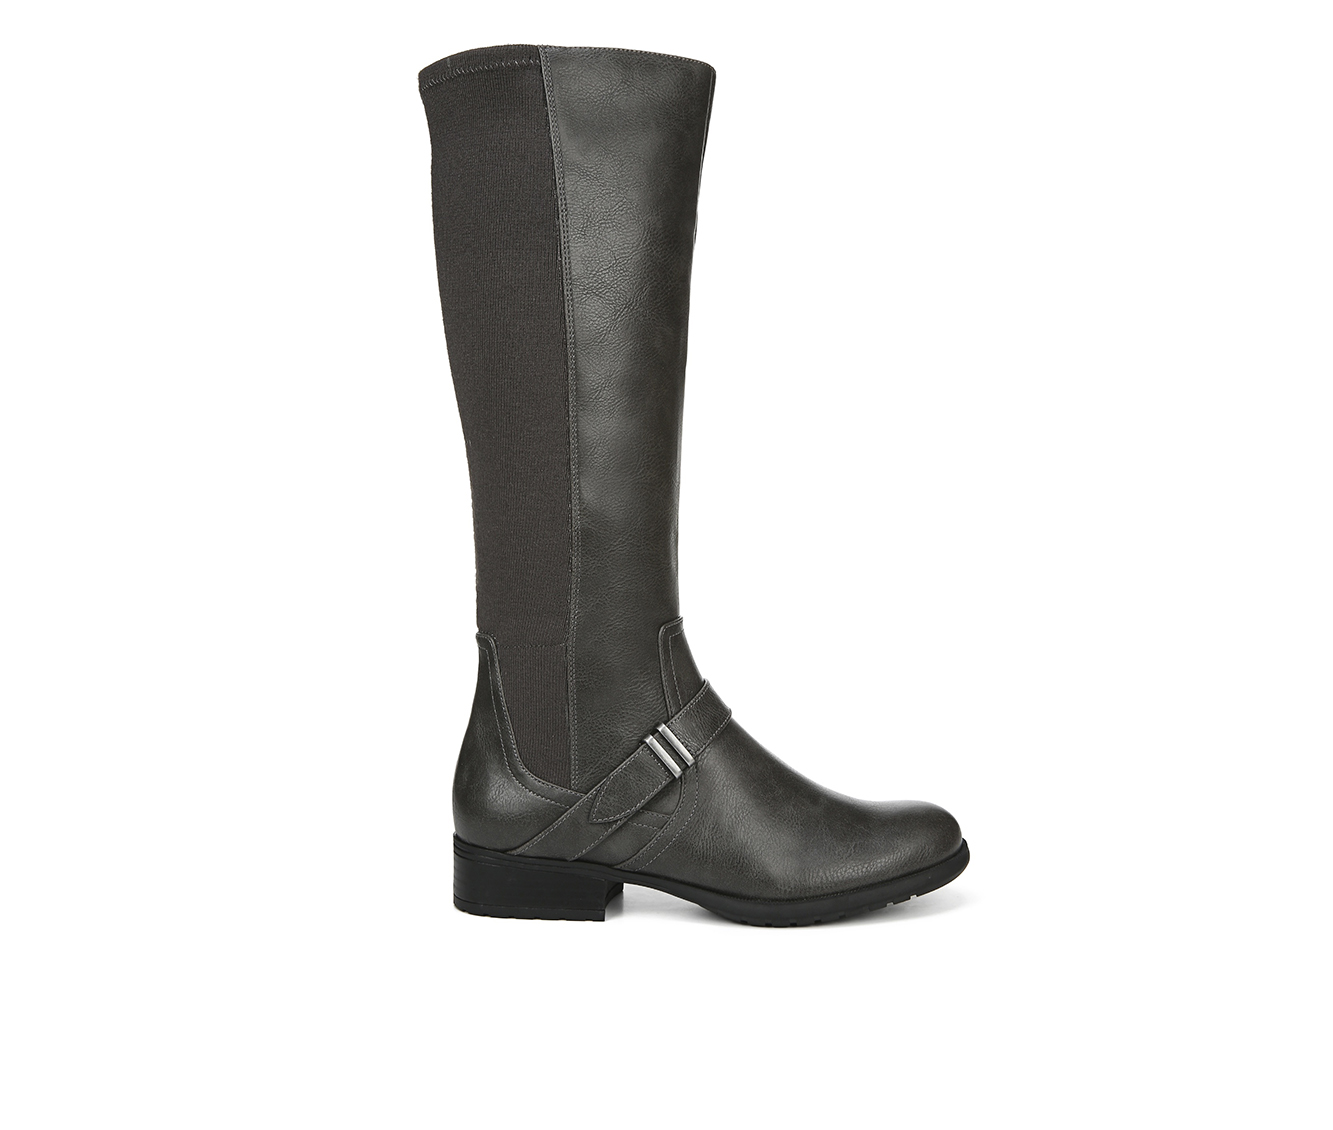 LifeStride Xtra Women's Boots (Gray)